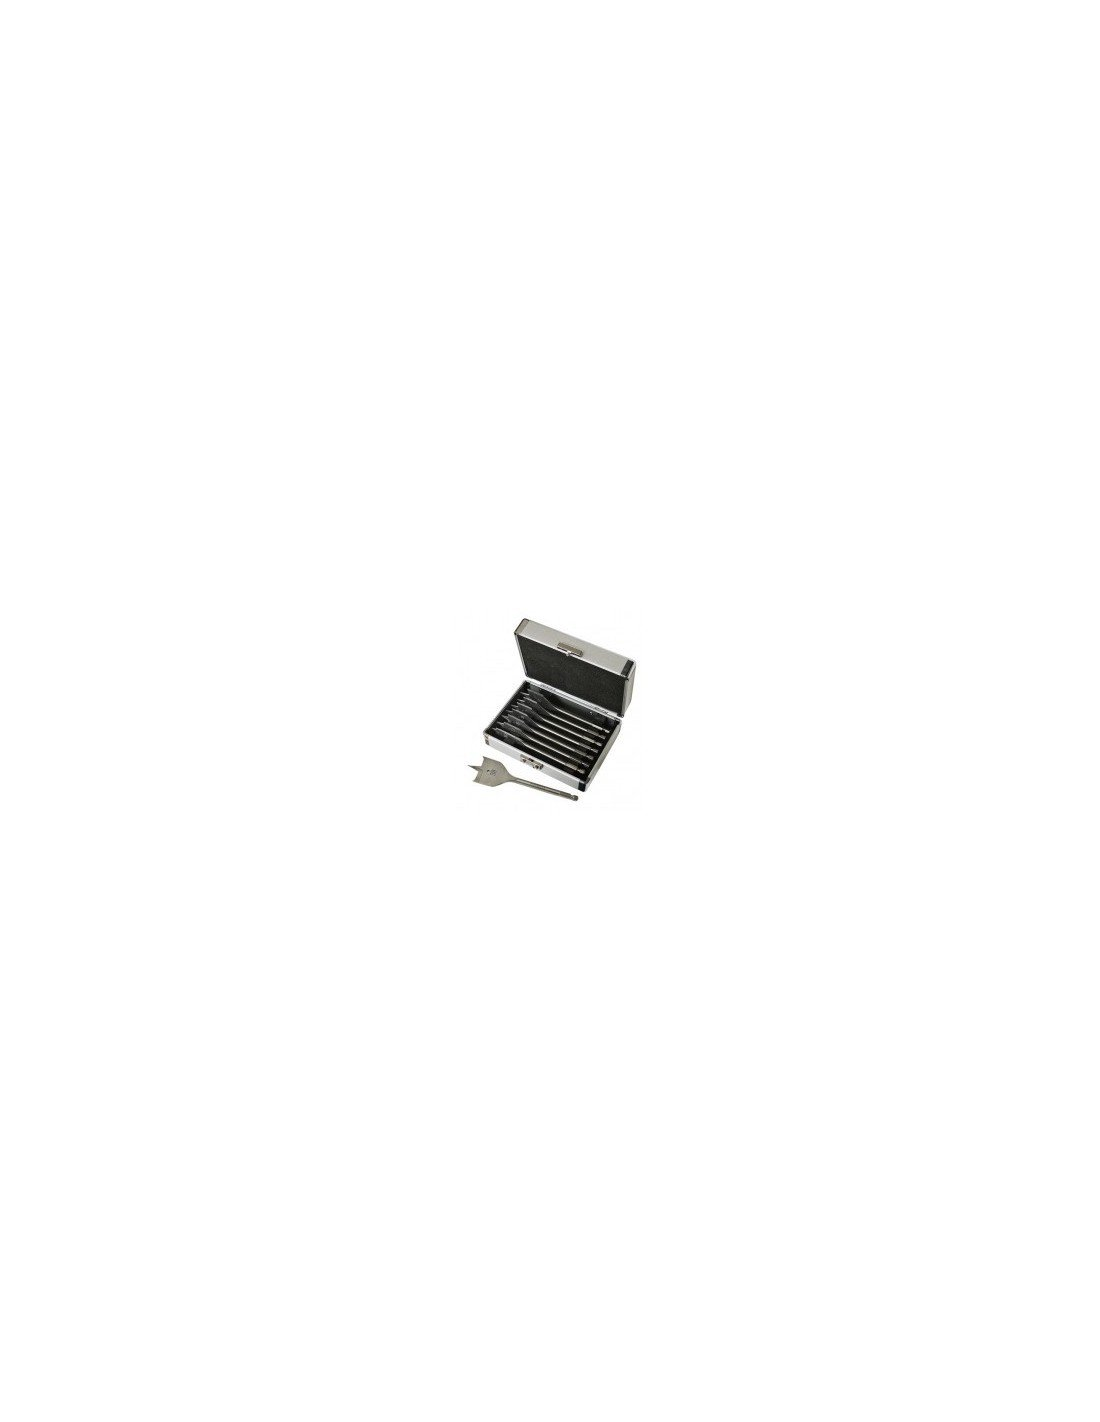 FACOM SC.ASX10x75 Tournevis ProTwist - Empreinte Torx 10x75 mm